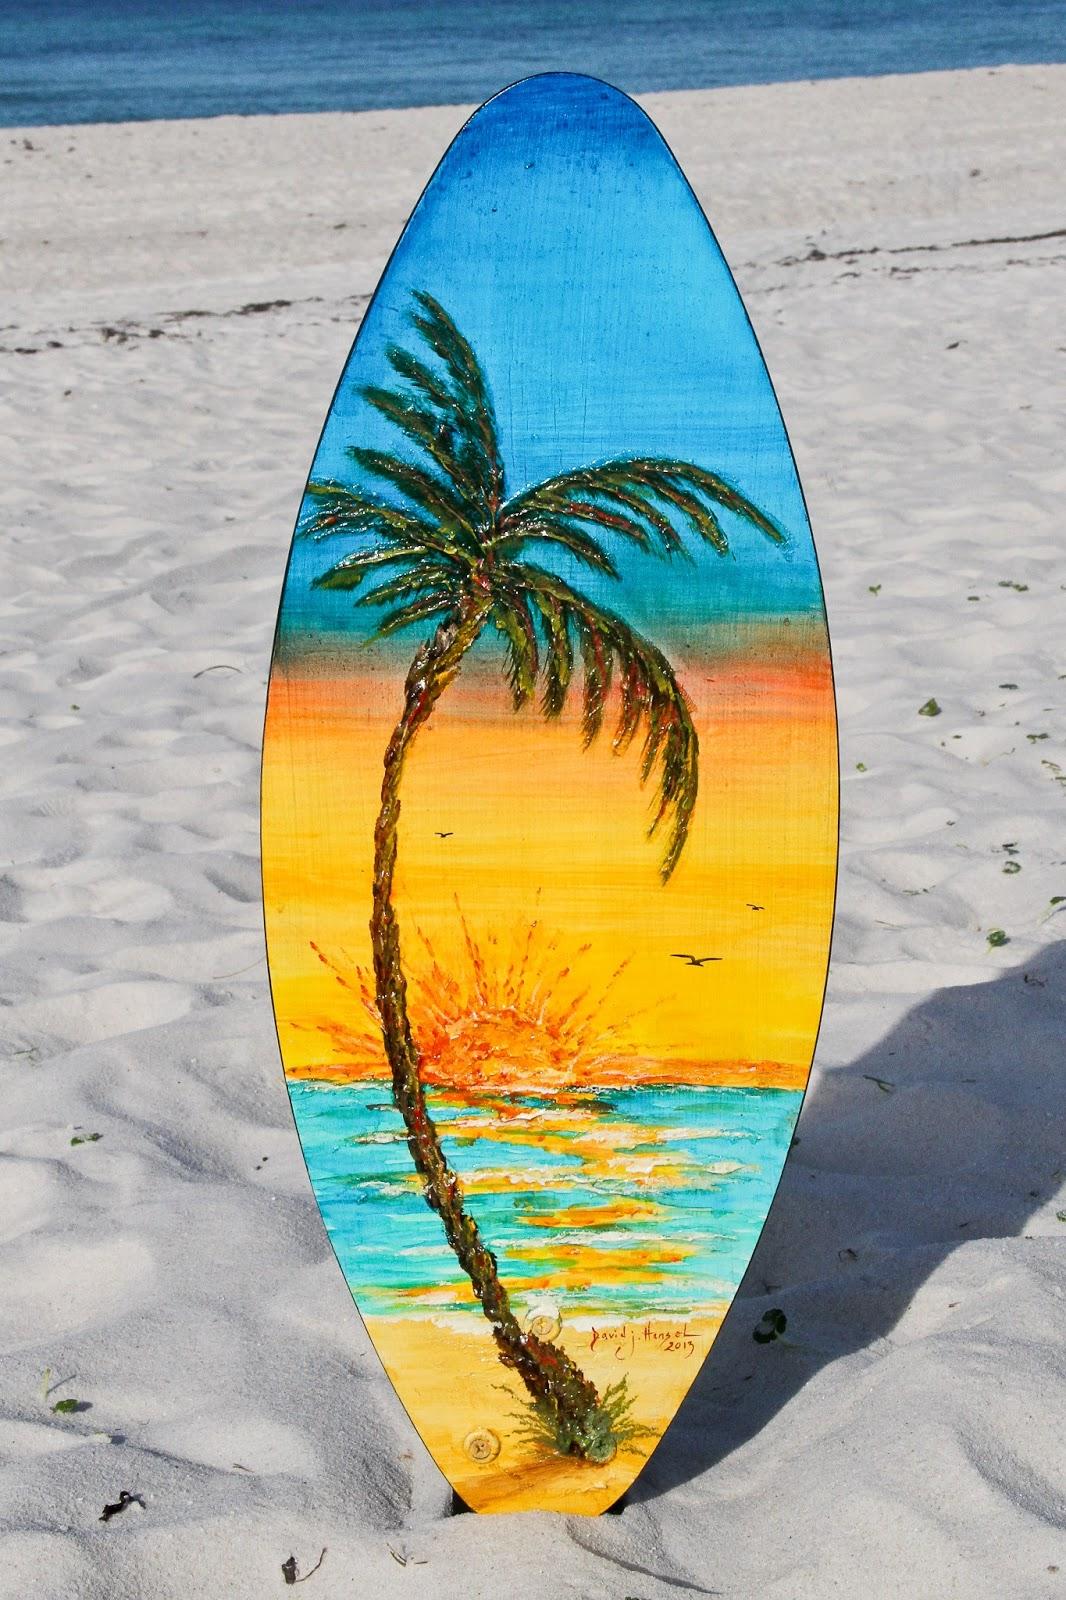 David J. Hansel the Artist: Hibiscus Flower End-Tables & Surf Board Art